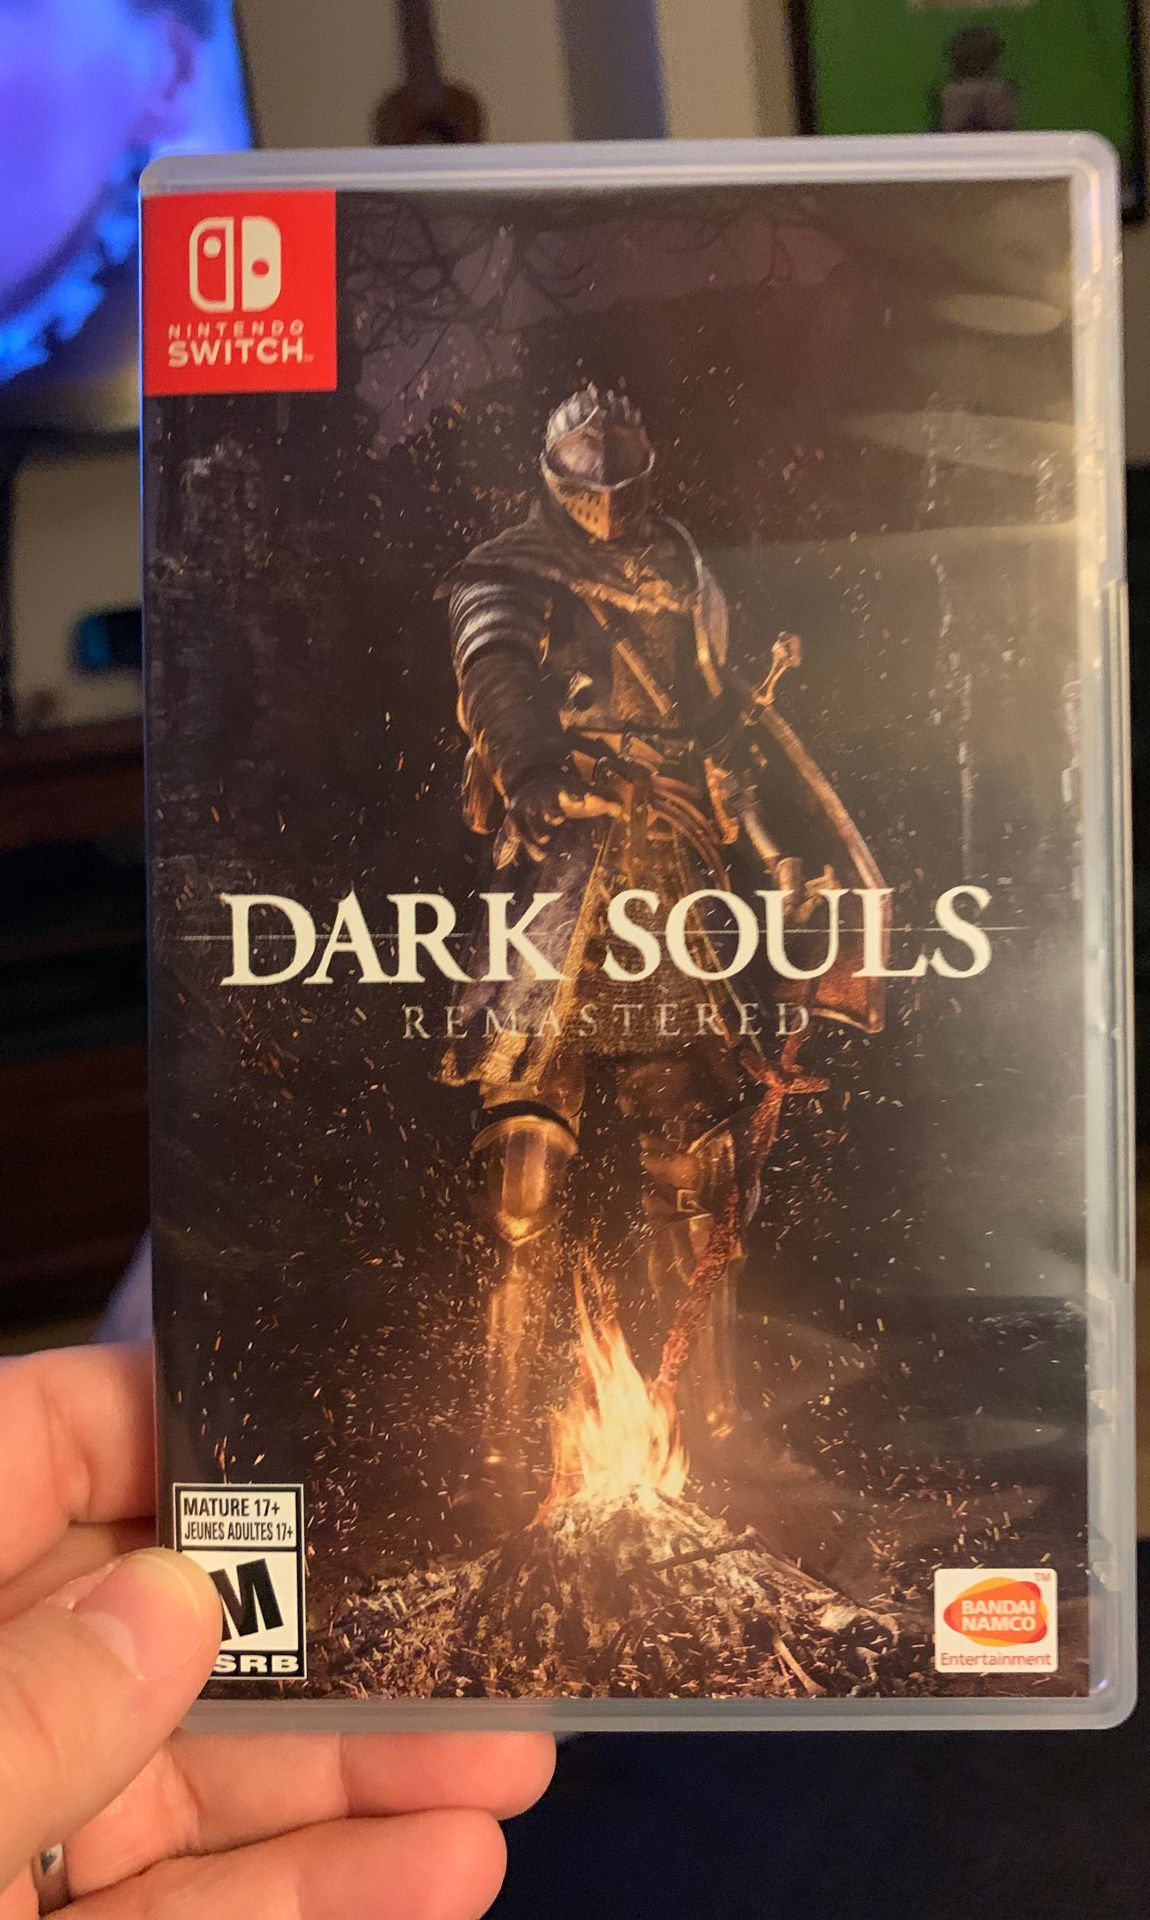 Dark souls switch game